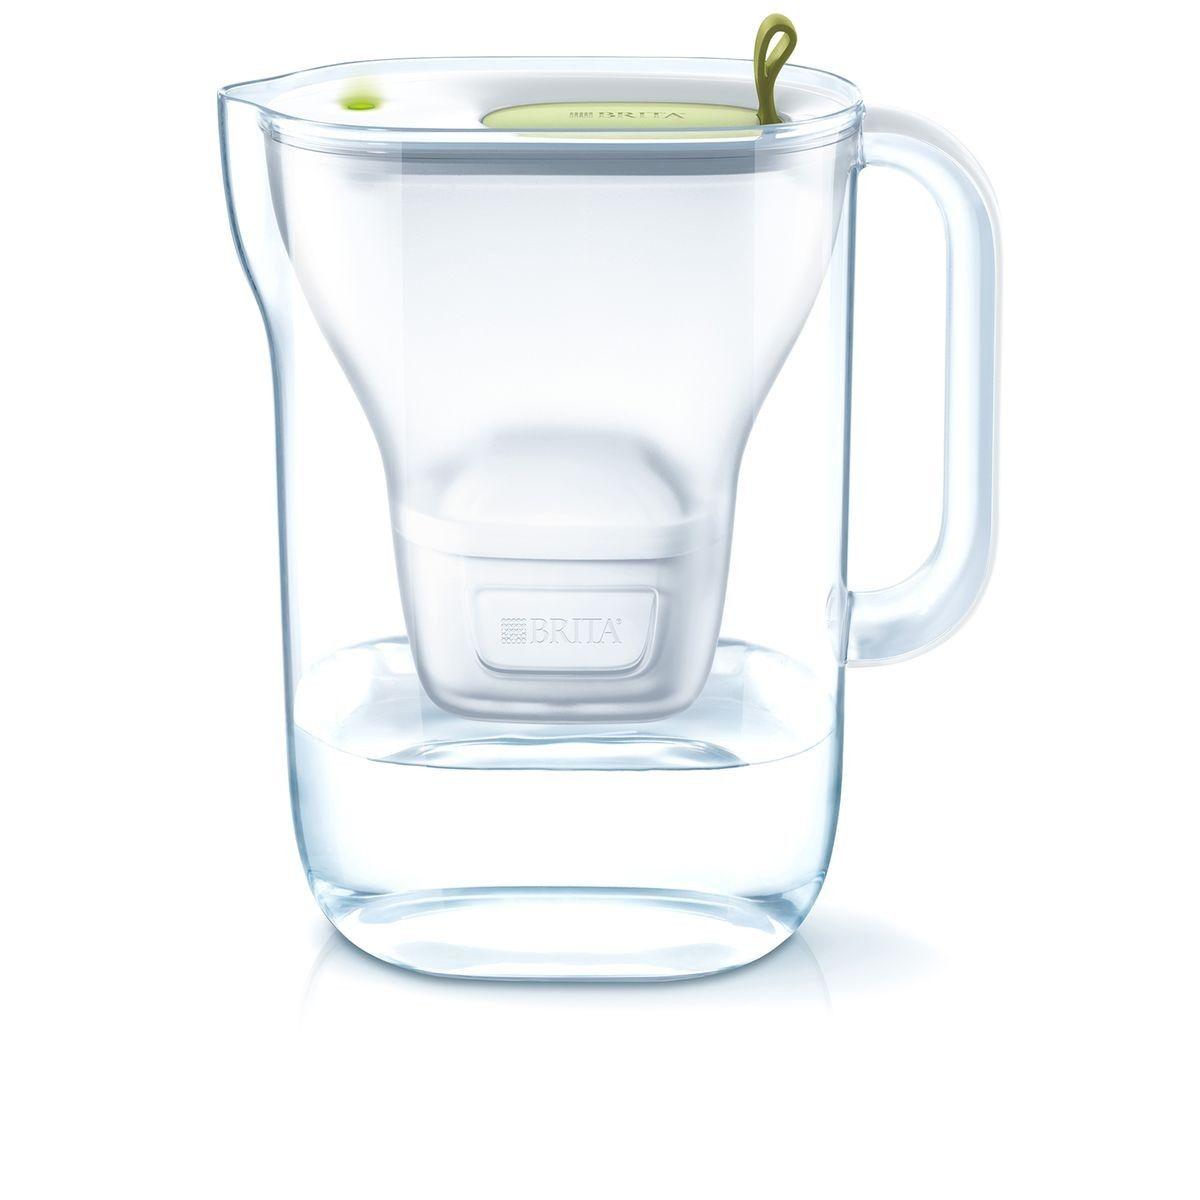 blanc Brita Marella XL Carafe d/'eau filtrante Maxtra